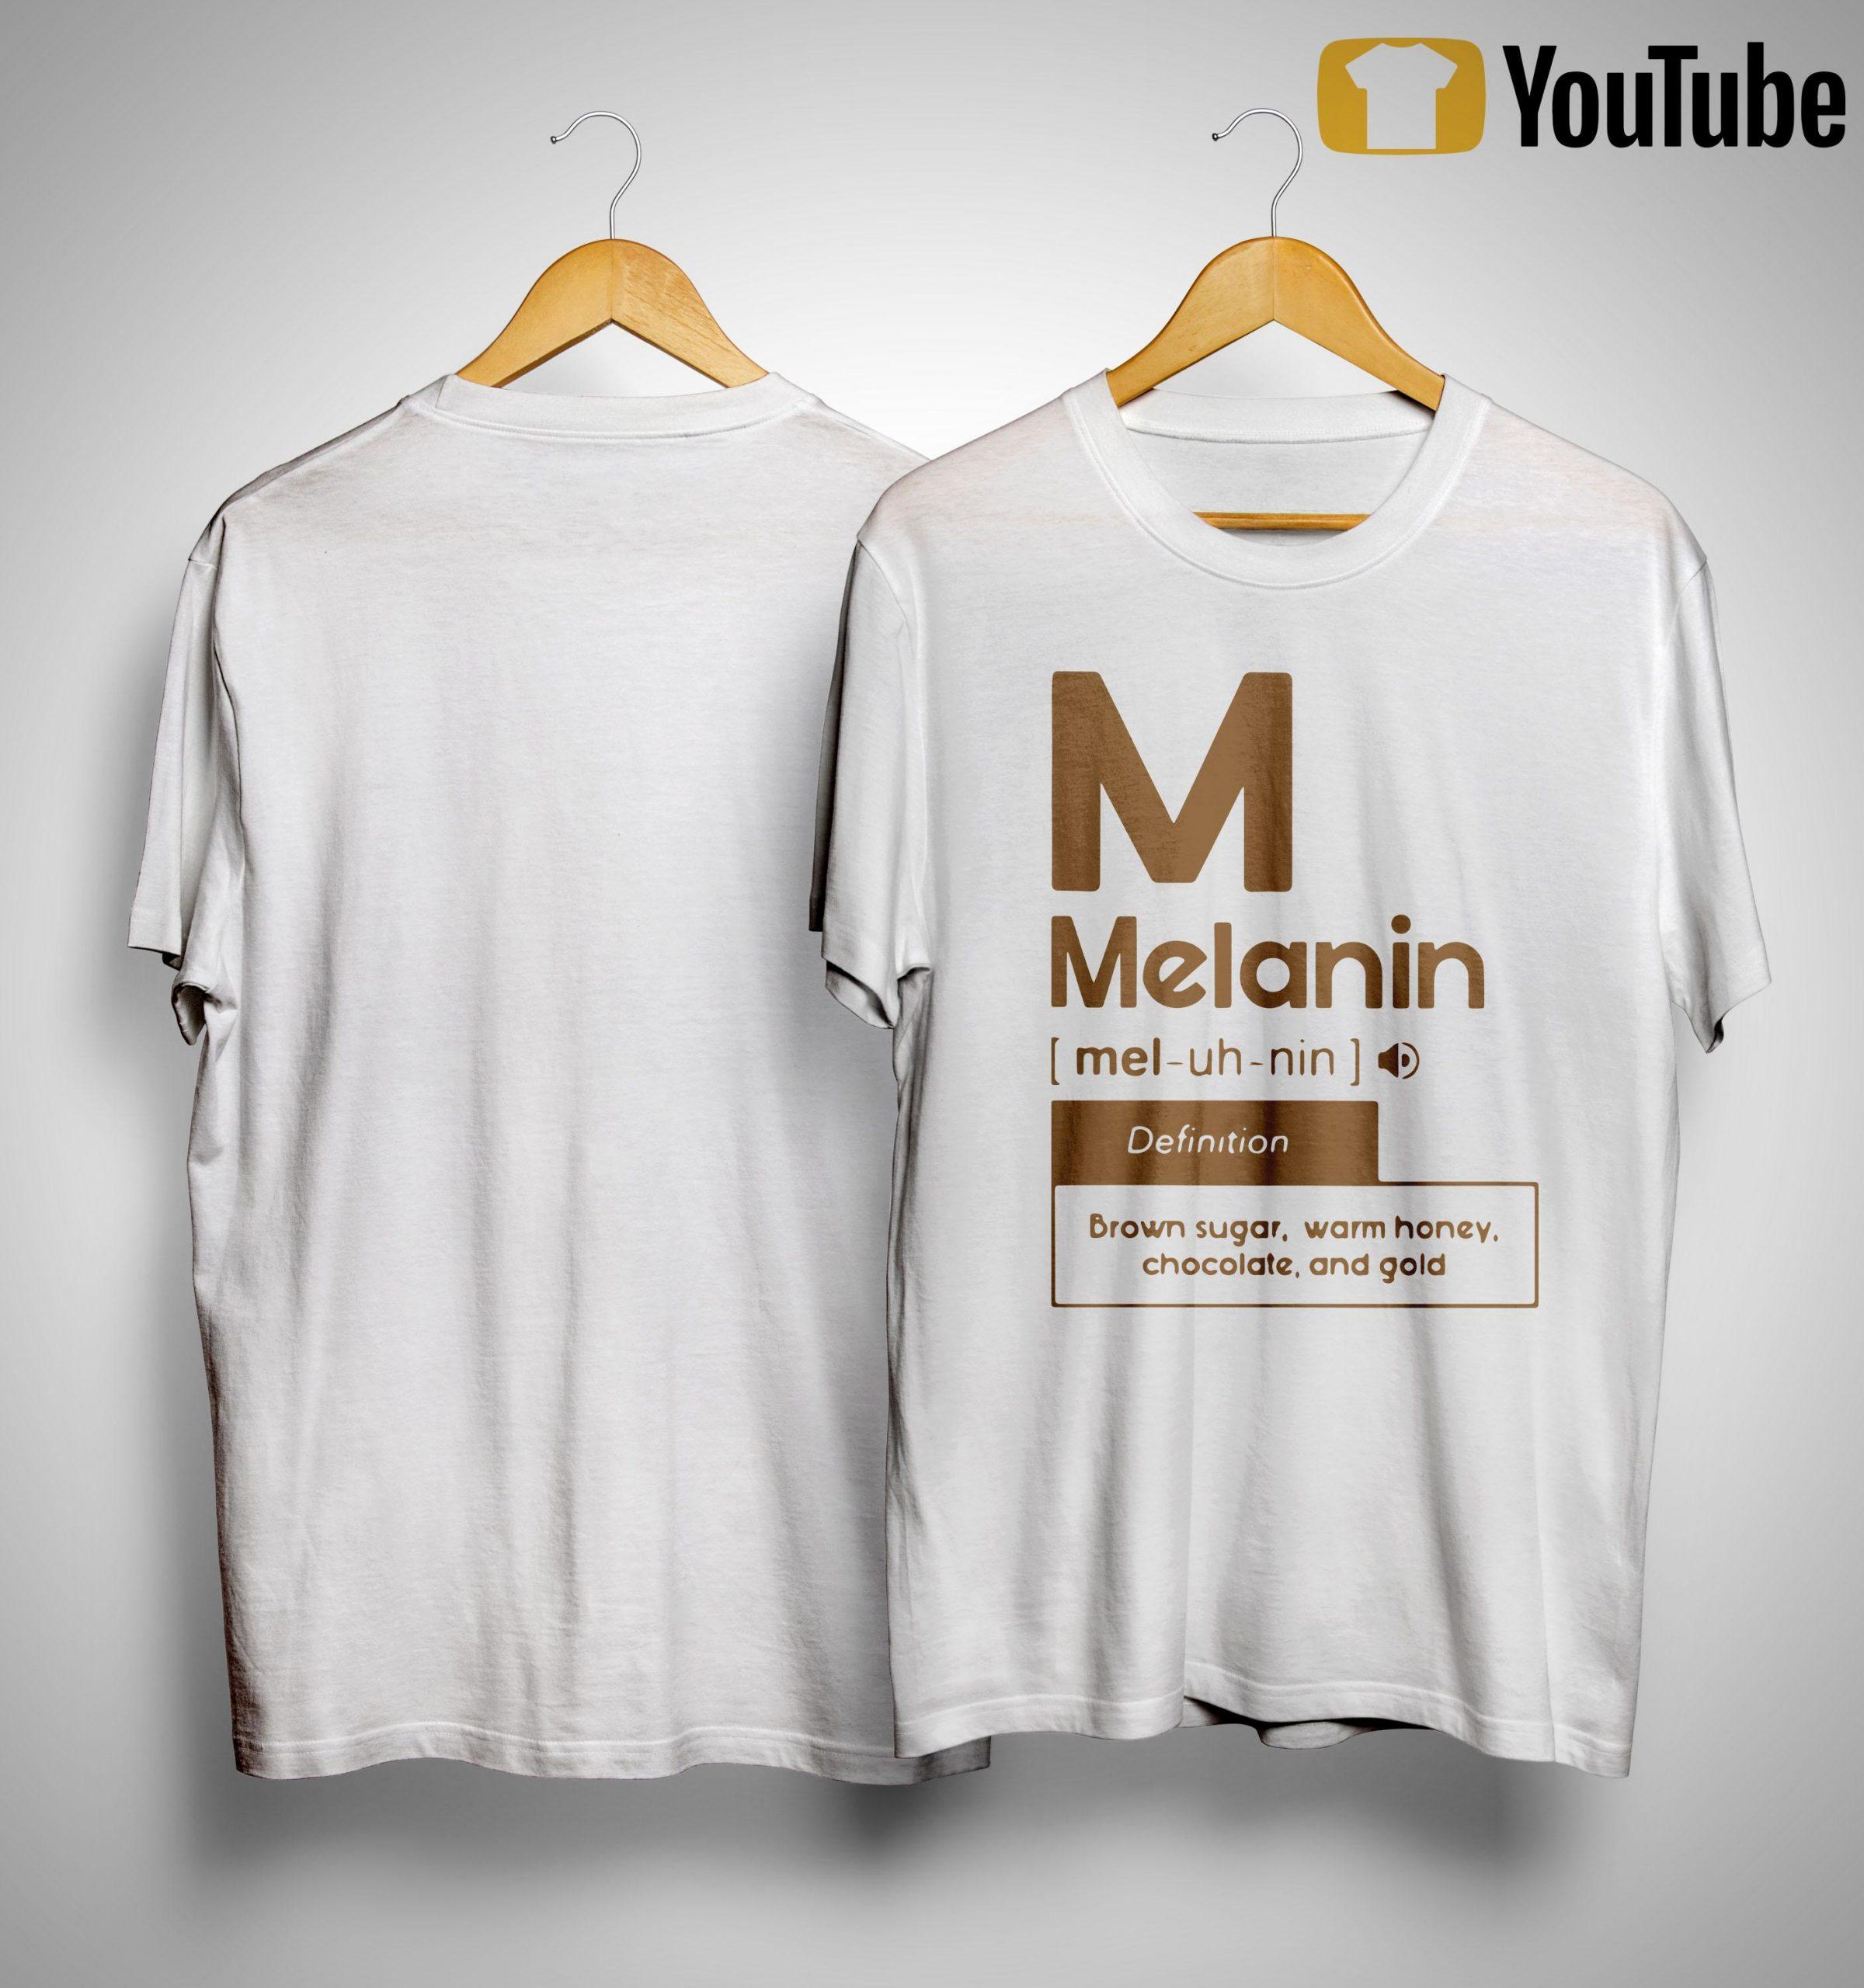 Melanin Definition Brown Sugar Warm Honey Chocolate And Gold Shirt